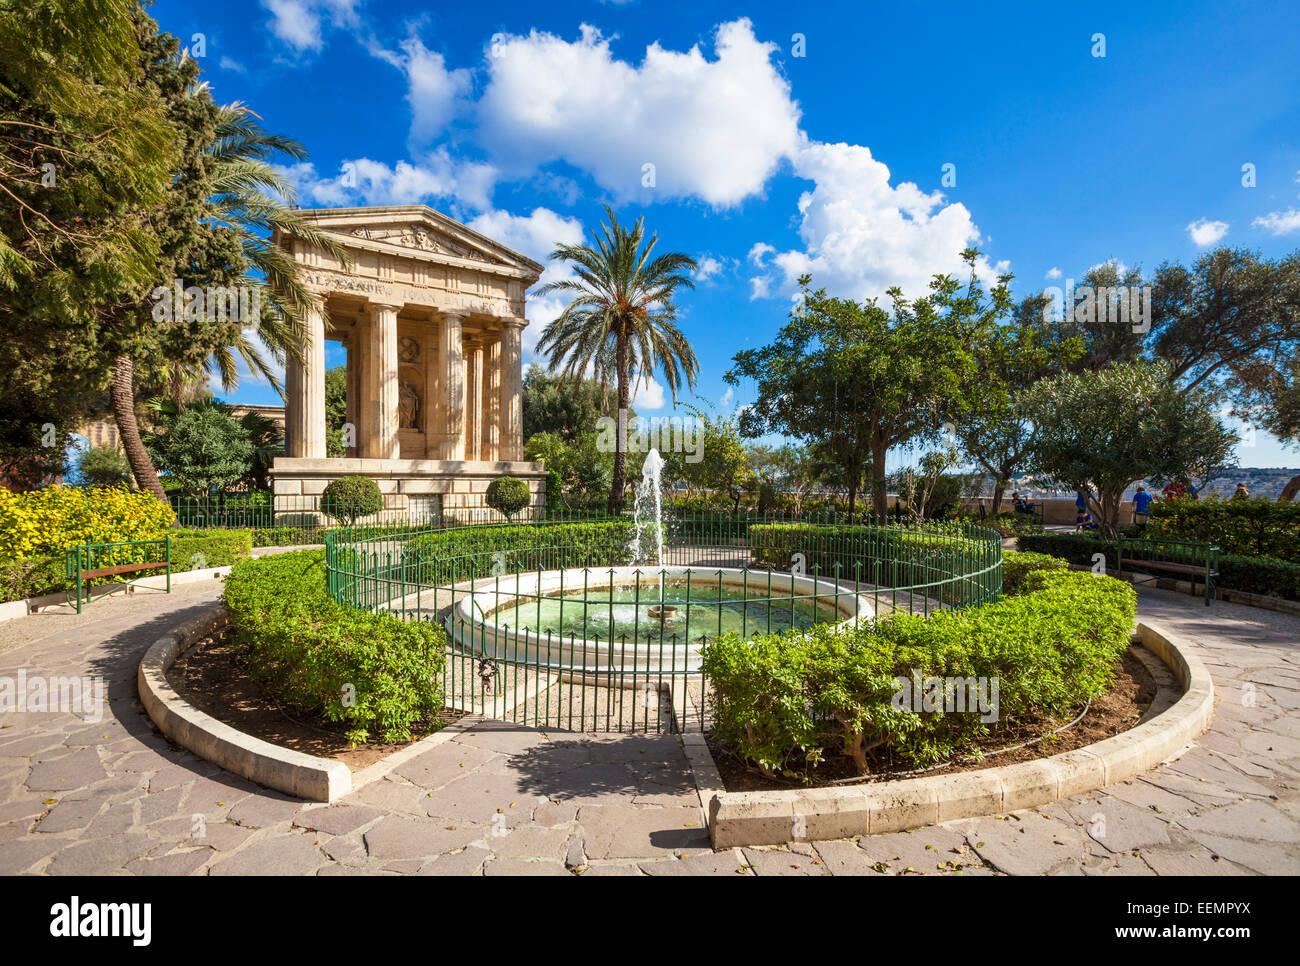 Lower Barrakka Gardens Valletta Malta EU Europe - Stock Image